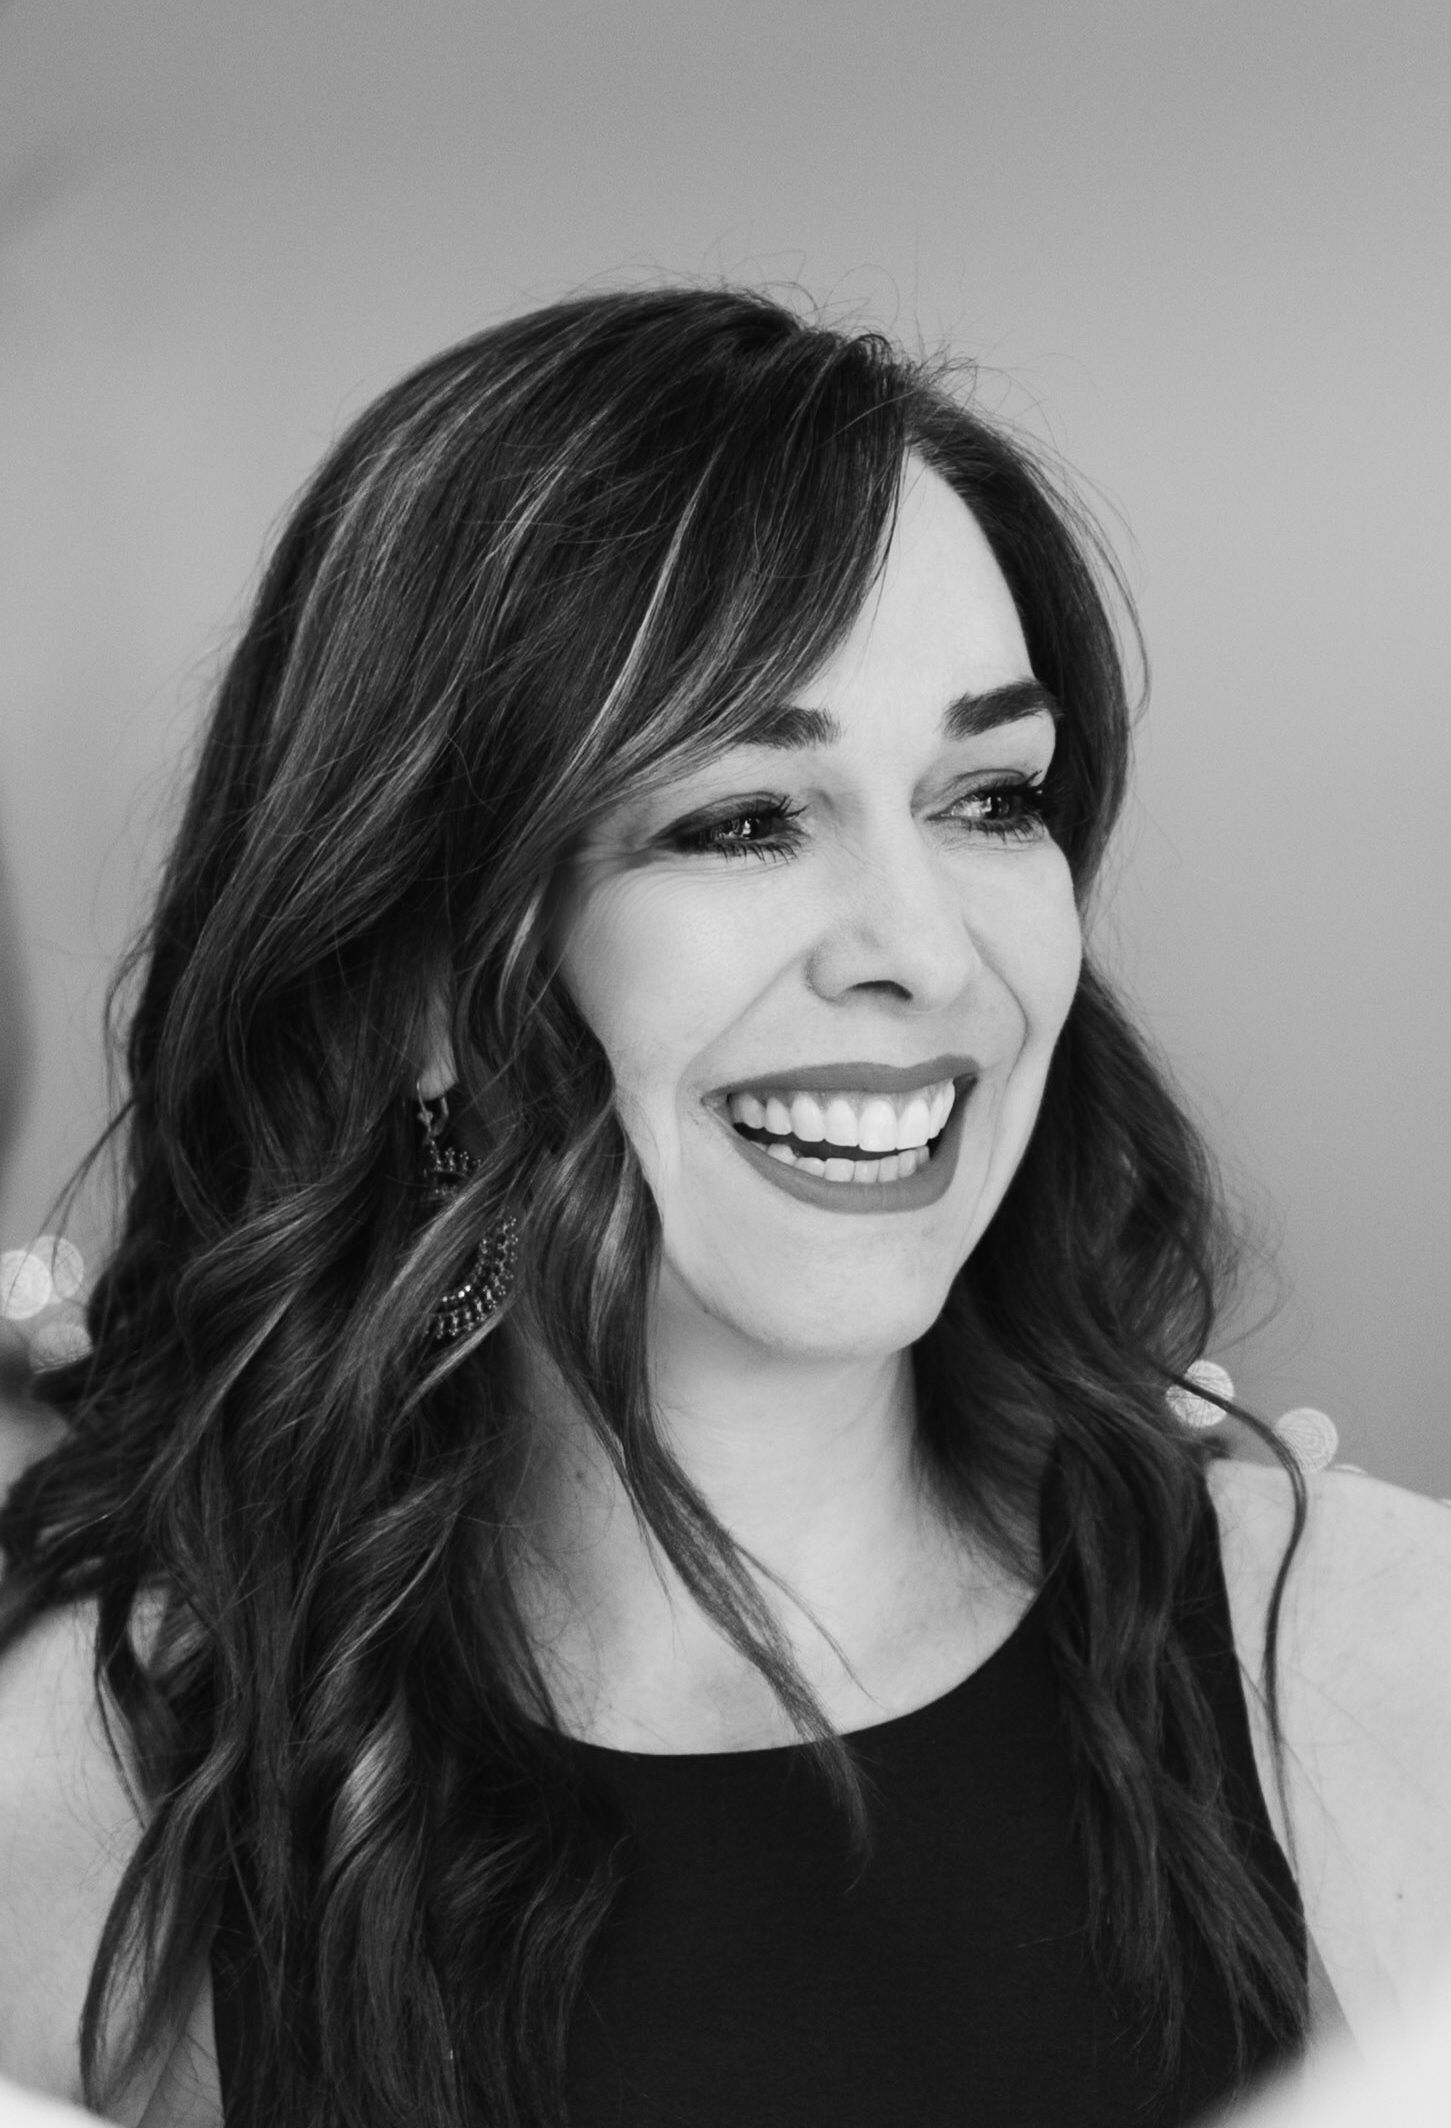 Jessica M. Chaix